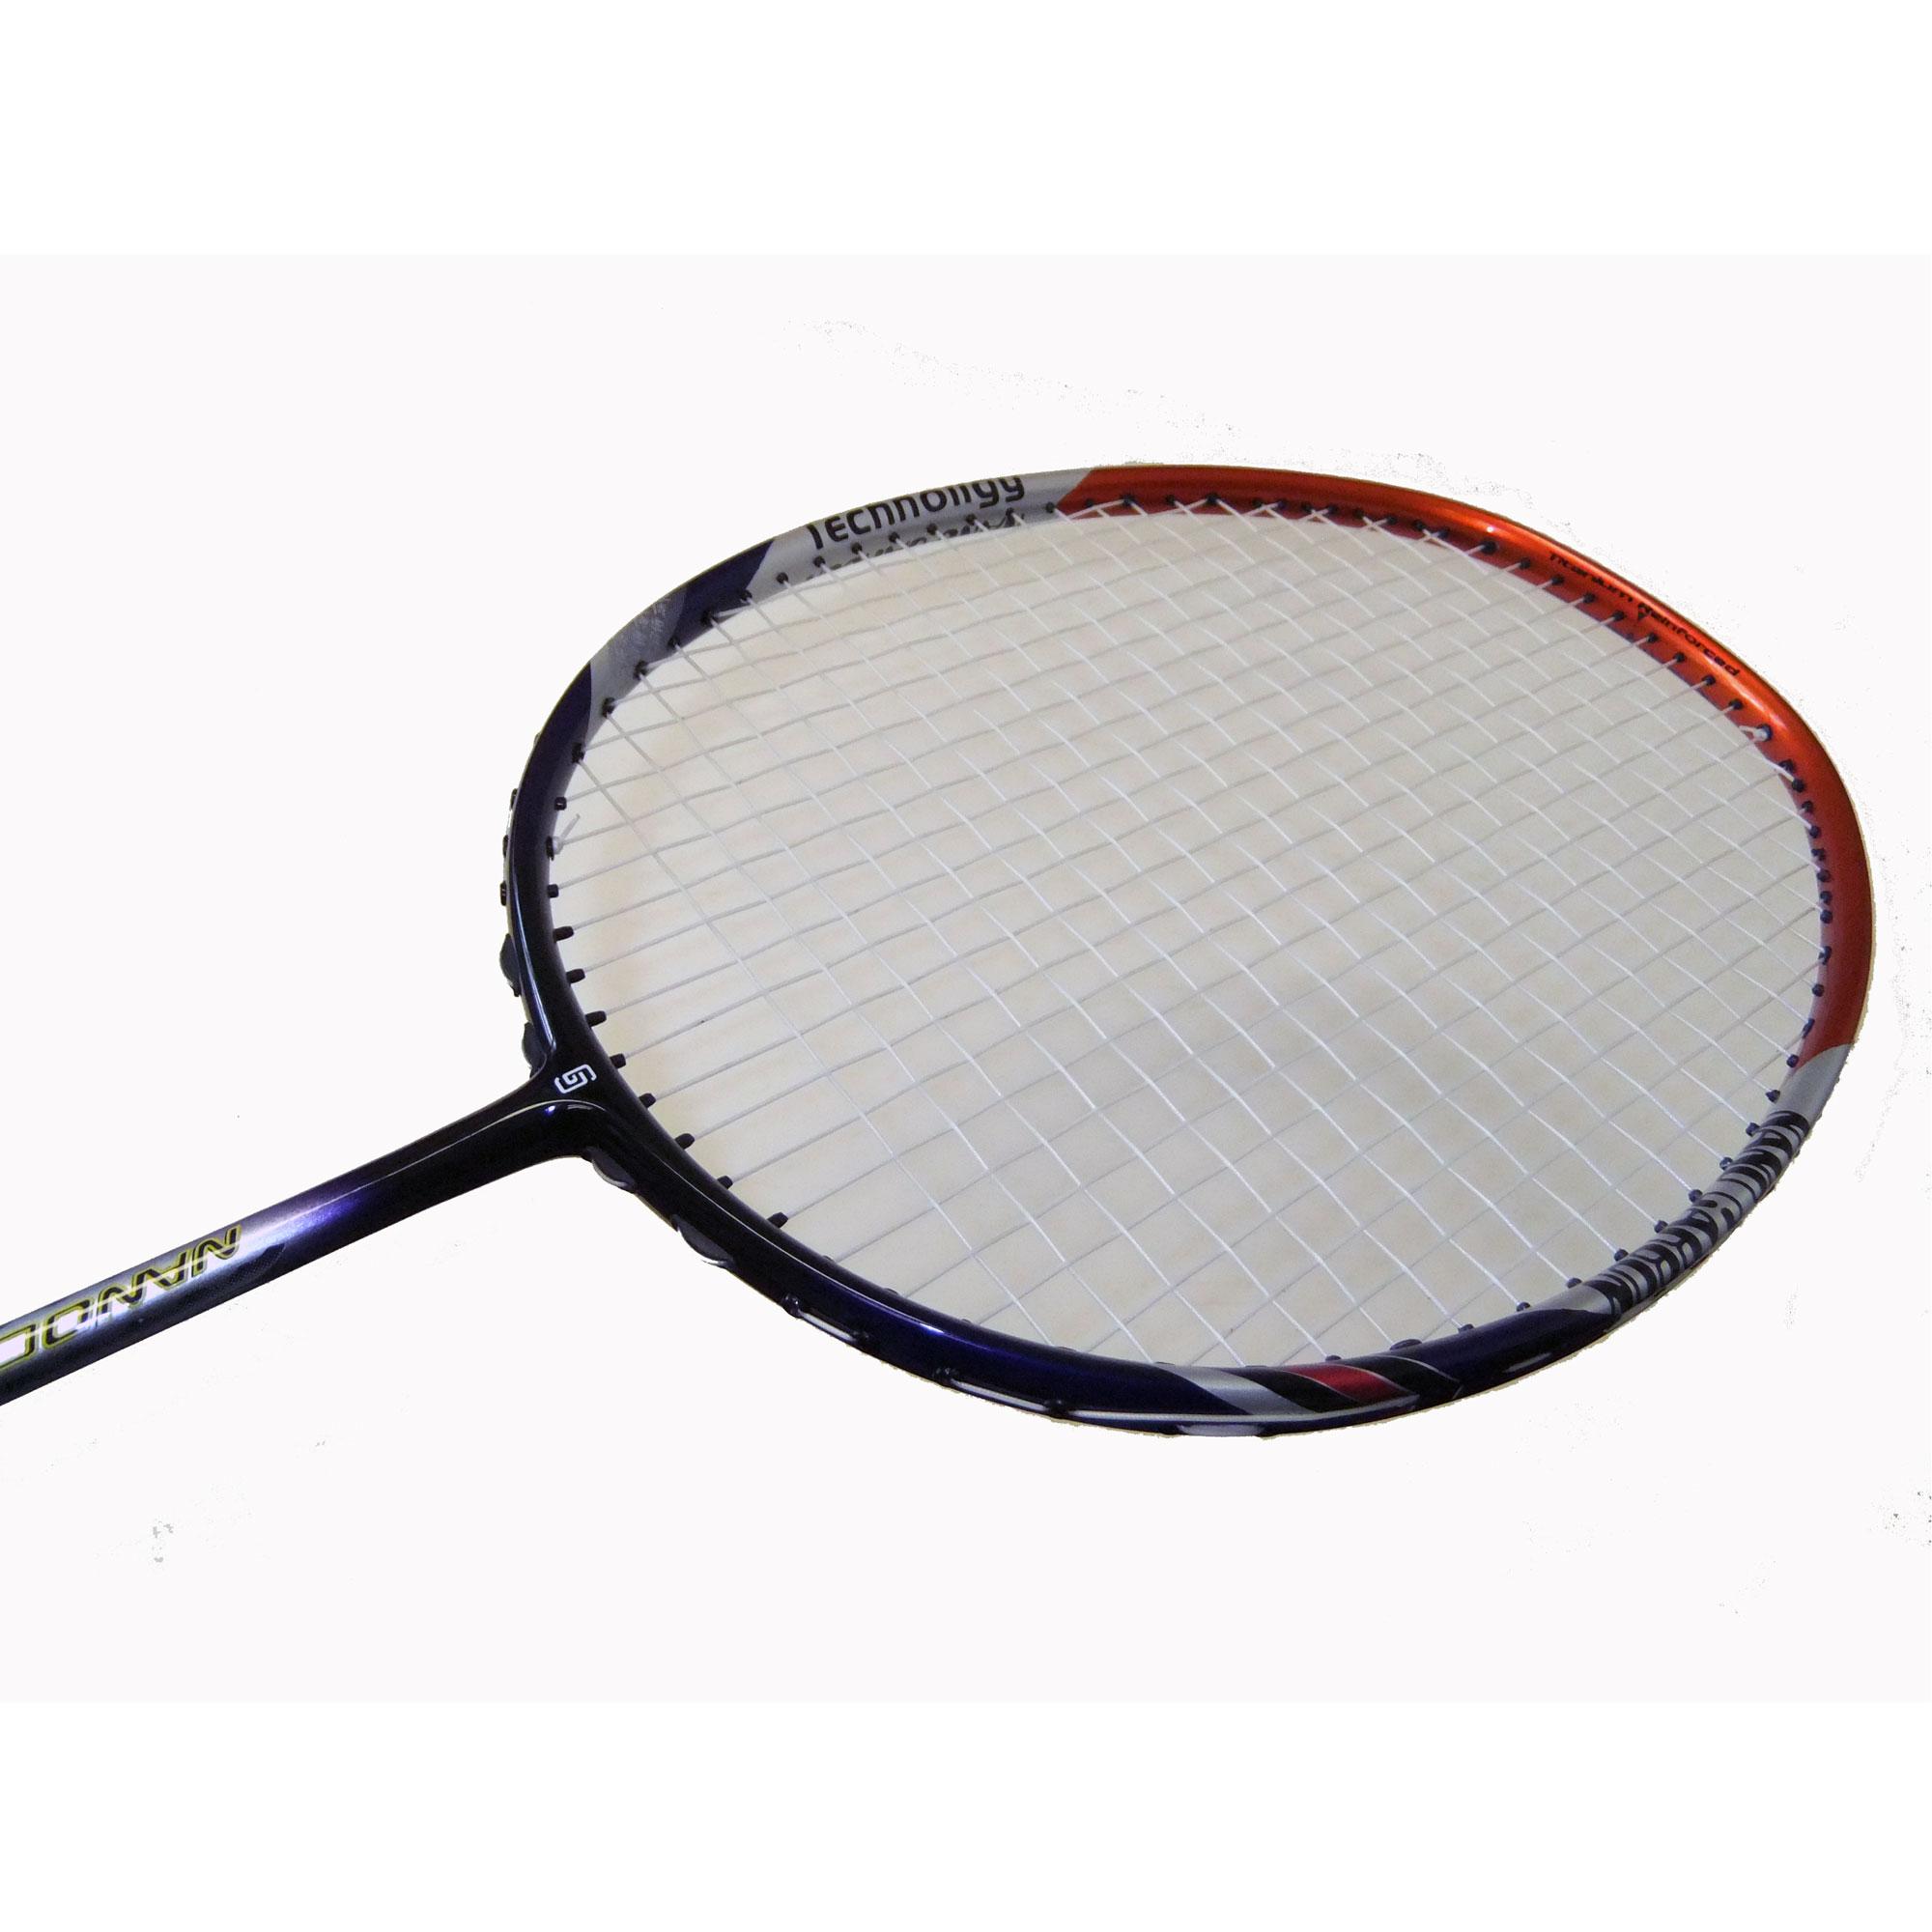 Genji Sports Nano Power 9000 Badminton Racket